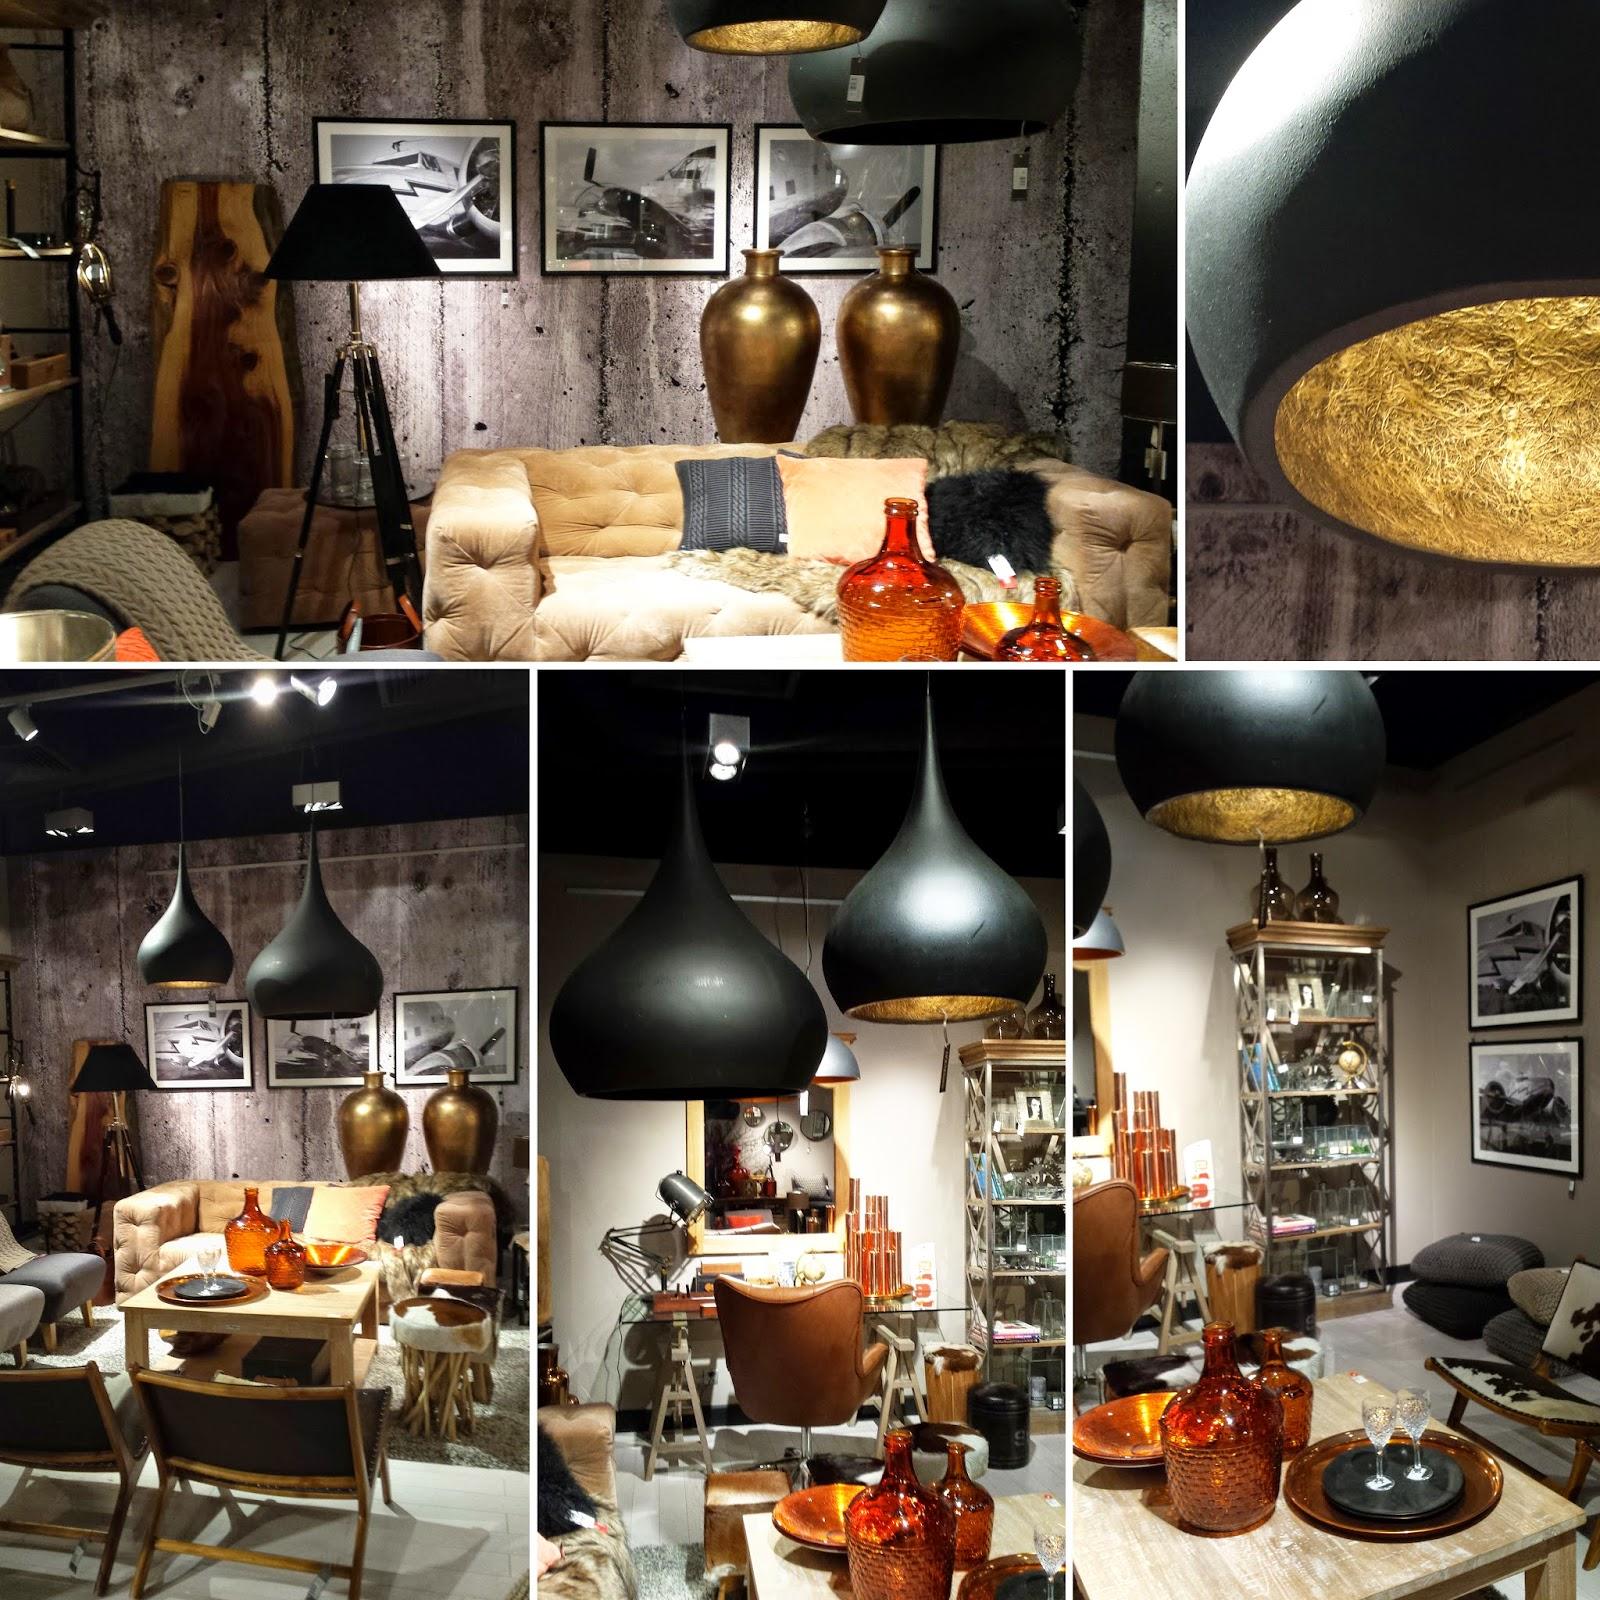 Dacon-Design-interiors-House&More-Miloo-Manutti-Eichholtz-Flamat-Pomax-Riviera Maison-Grand Design-meble skandynawskie-ogrodowe